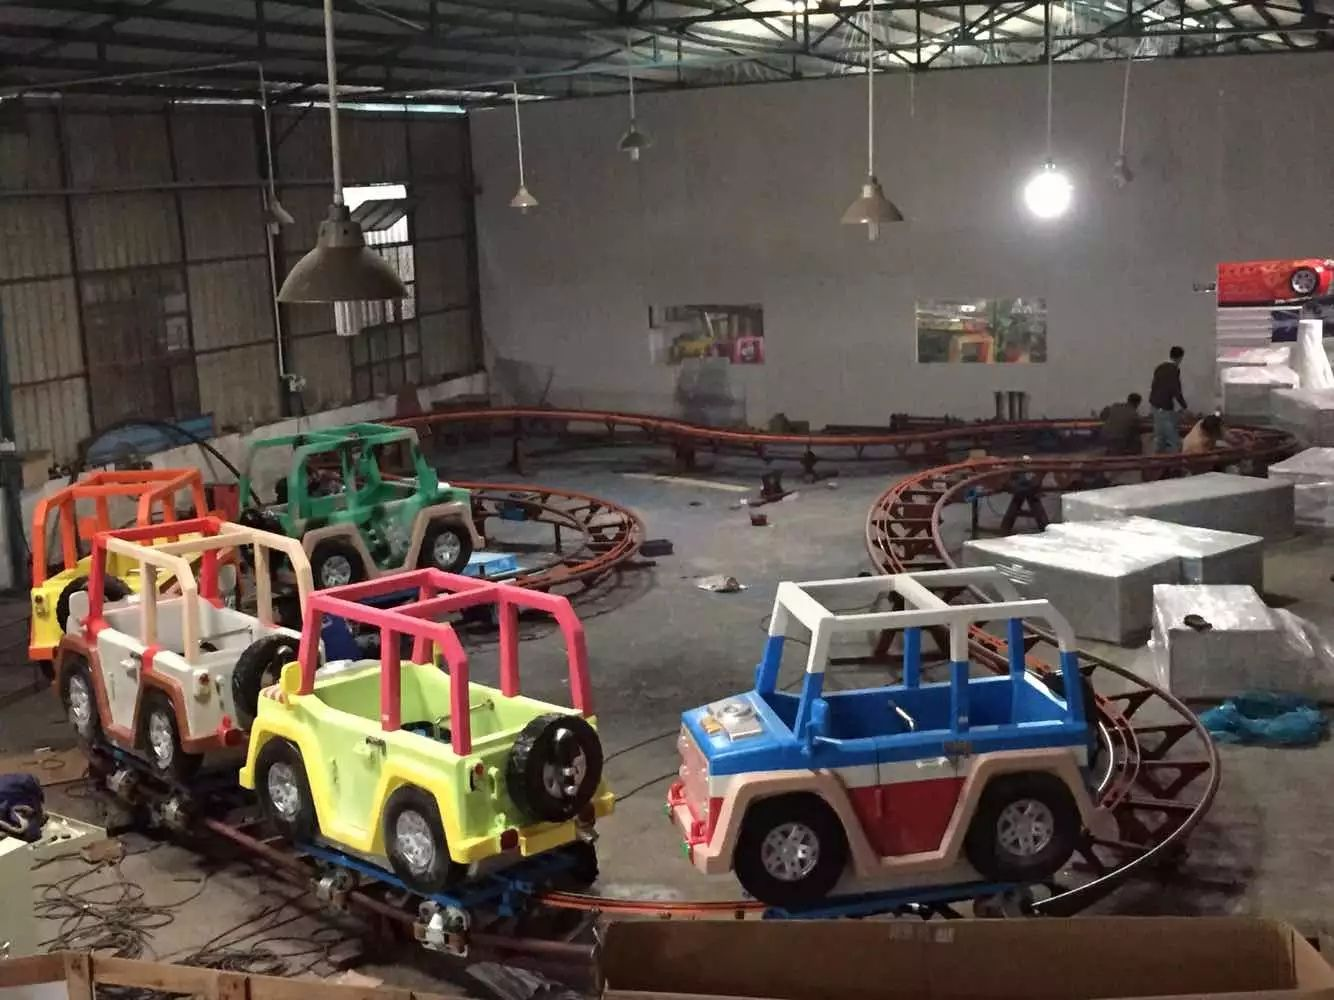 Beston Jeep Car Mini Roller Coaster For Sale Kid Roller Coaster Jeep Cars Roller Coaster Mini backyard roller coaster